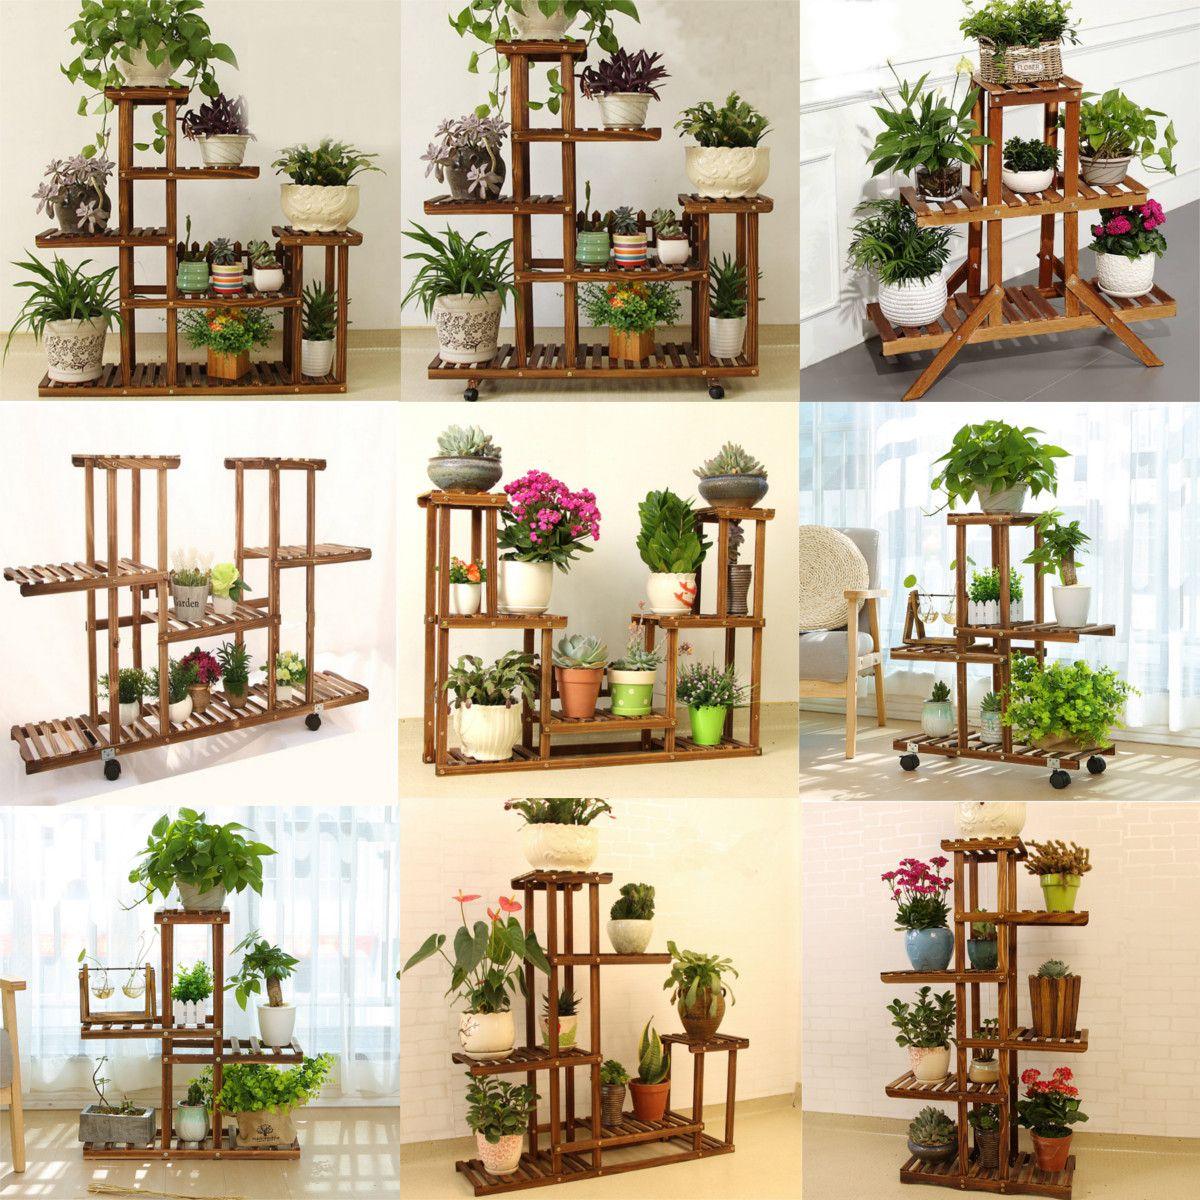 Hallolure Wooden Plant Stand Indoor Outdoor Patio Garden Planter